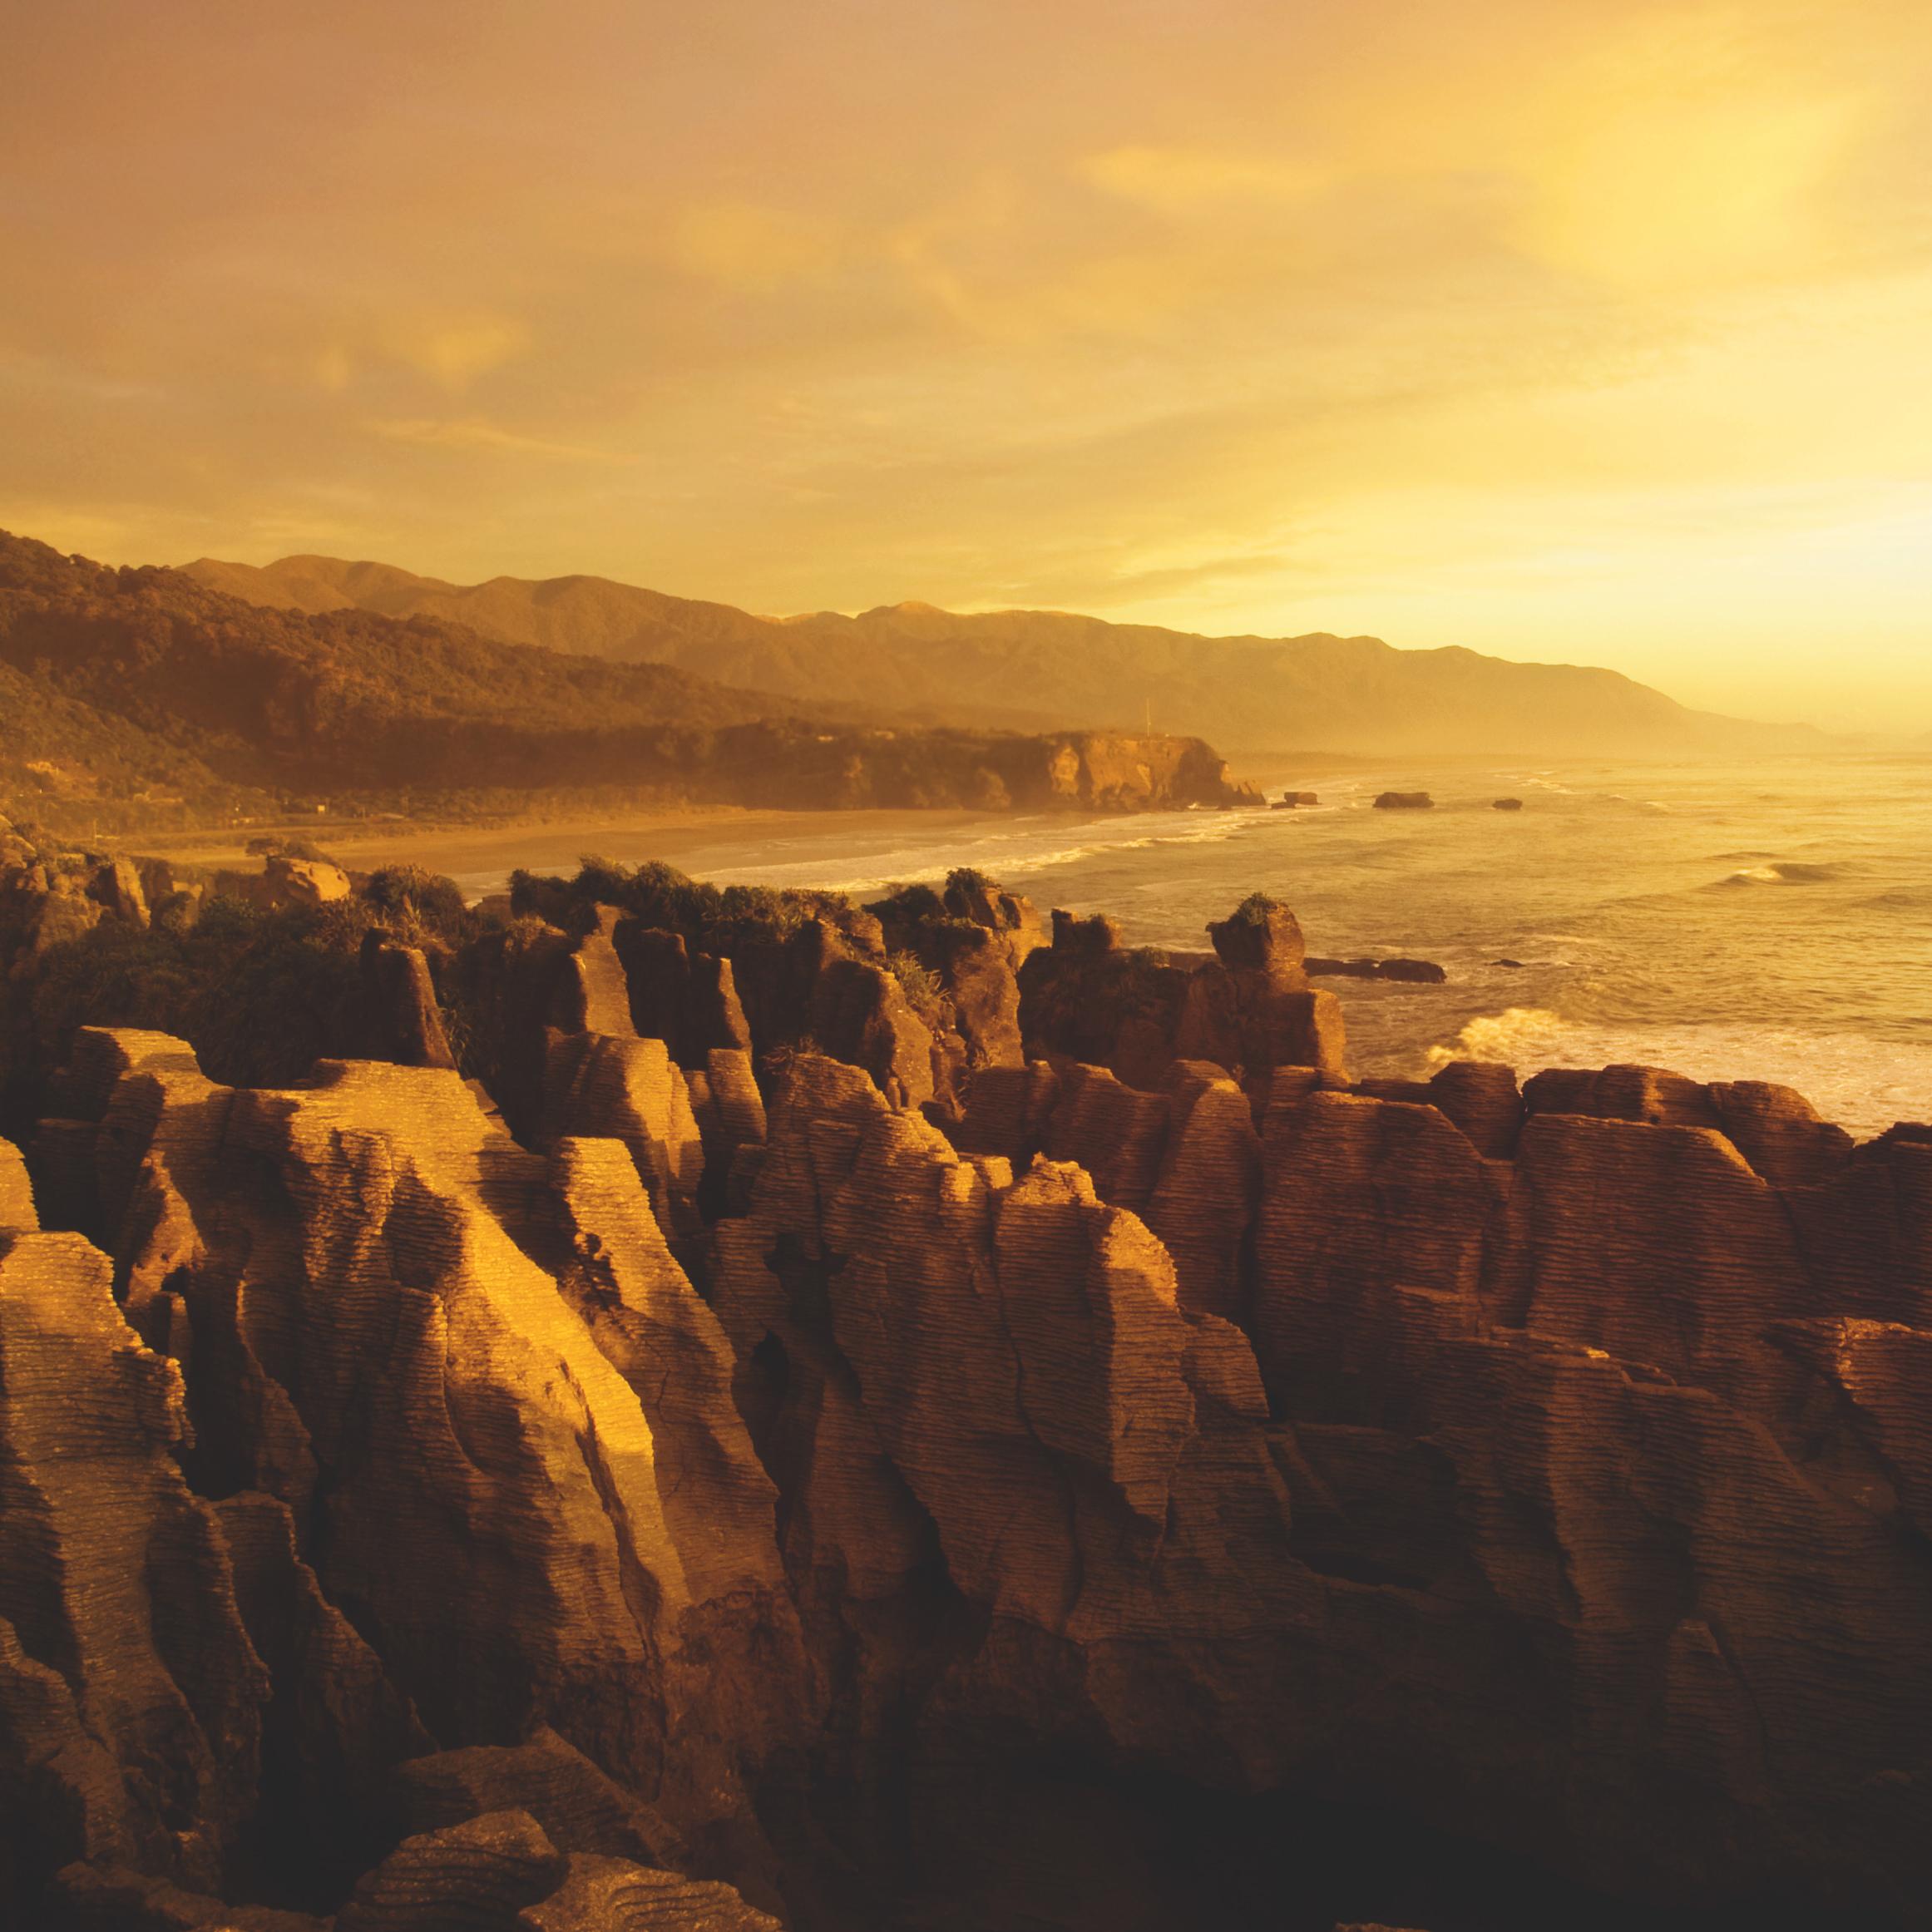 Pancake rocks and beach